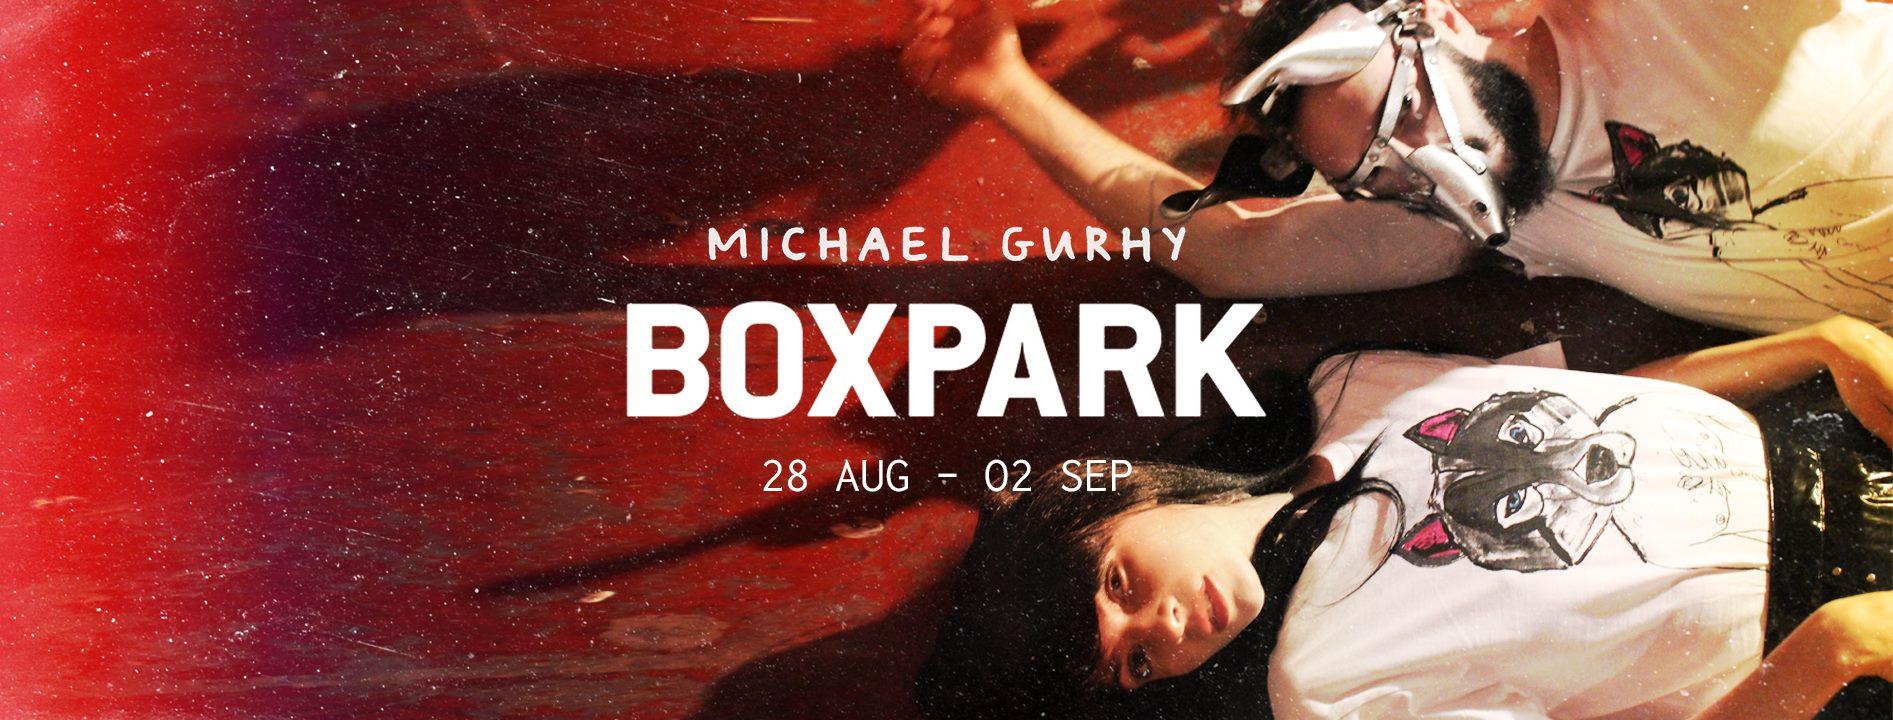 MICHAEL GURHY, FASHION & ART POP UP @BOXPARK SHOREDITCH